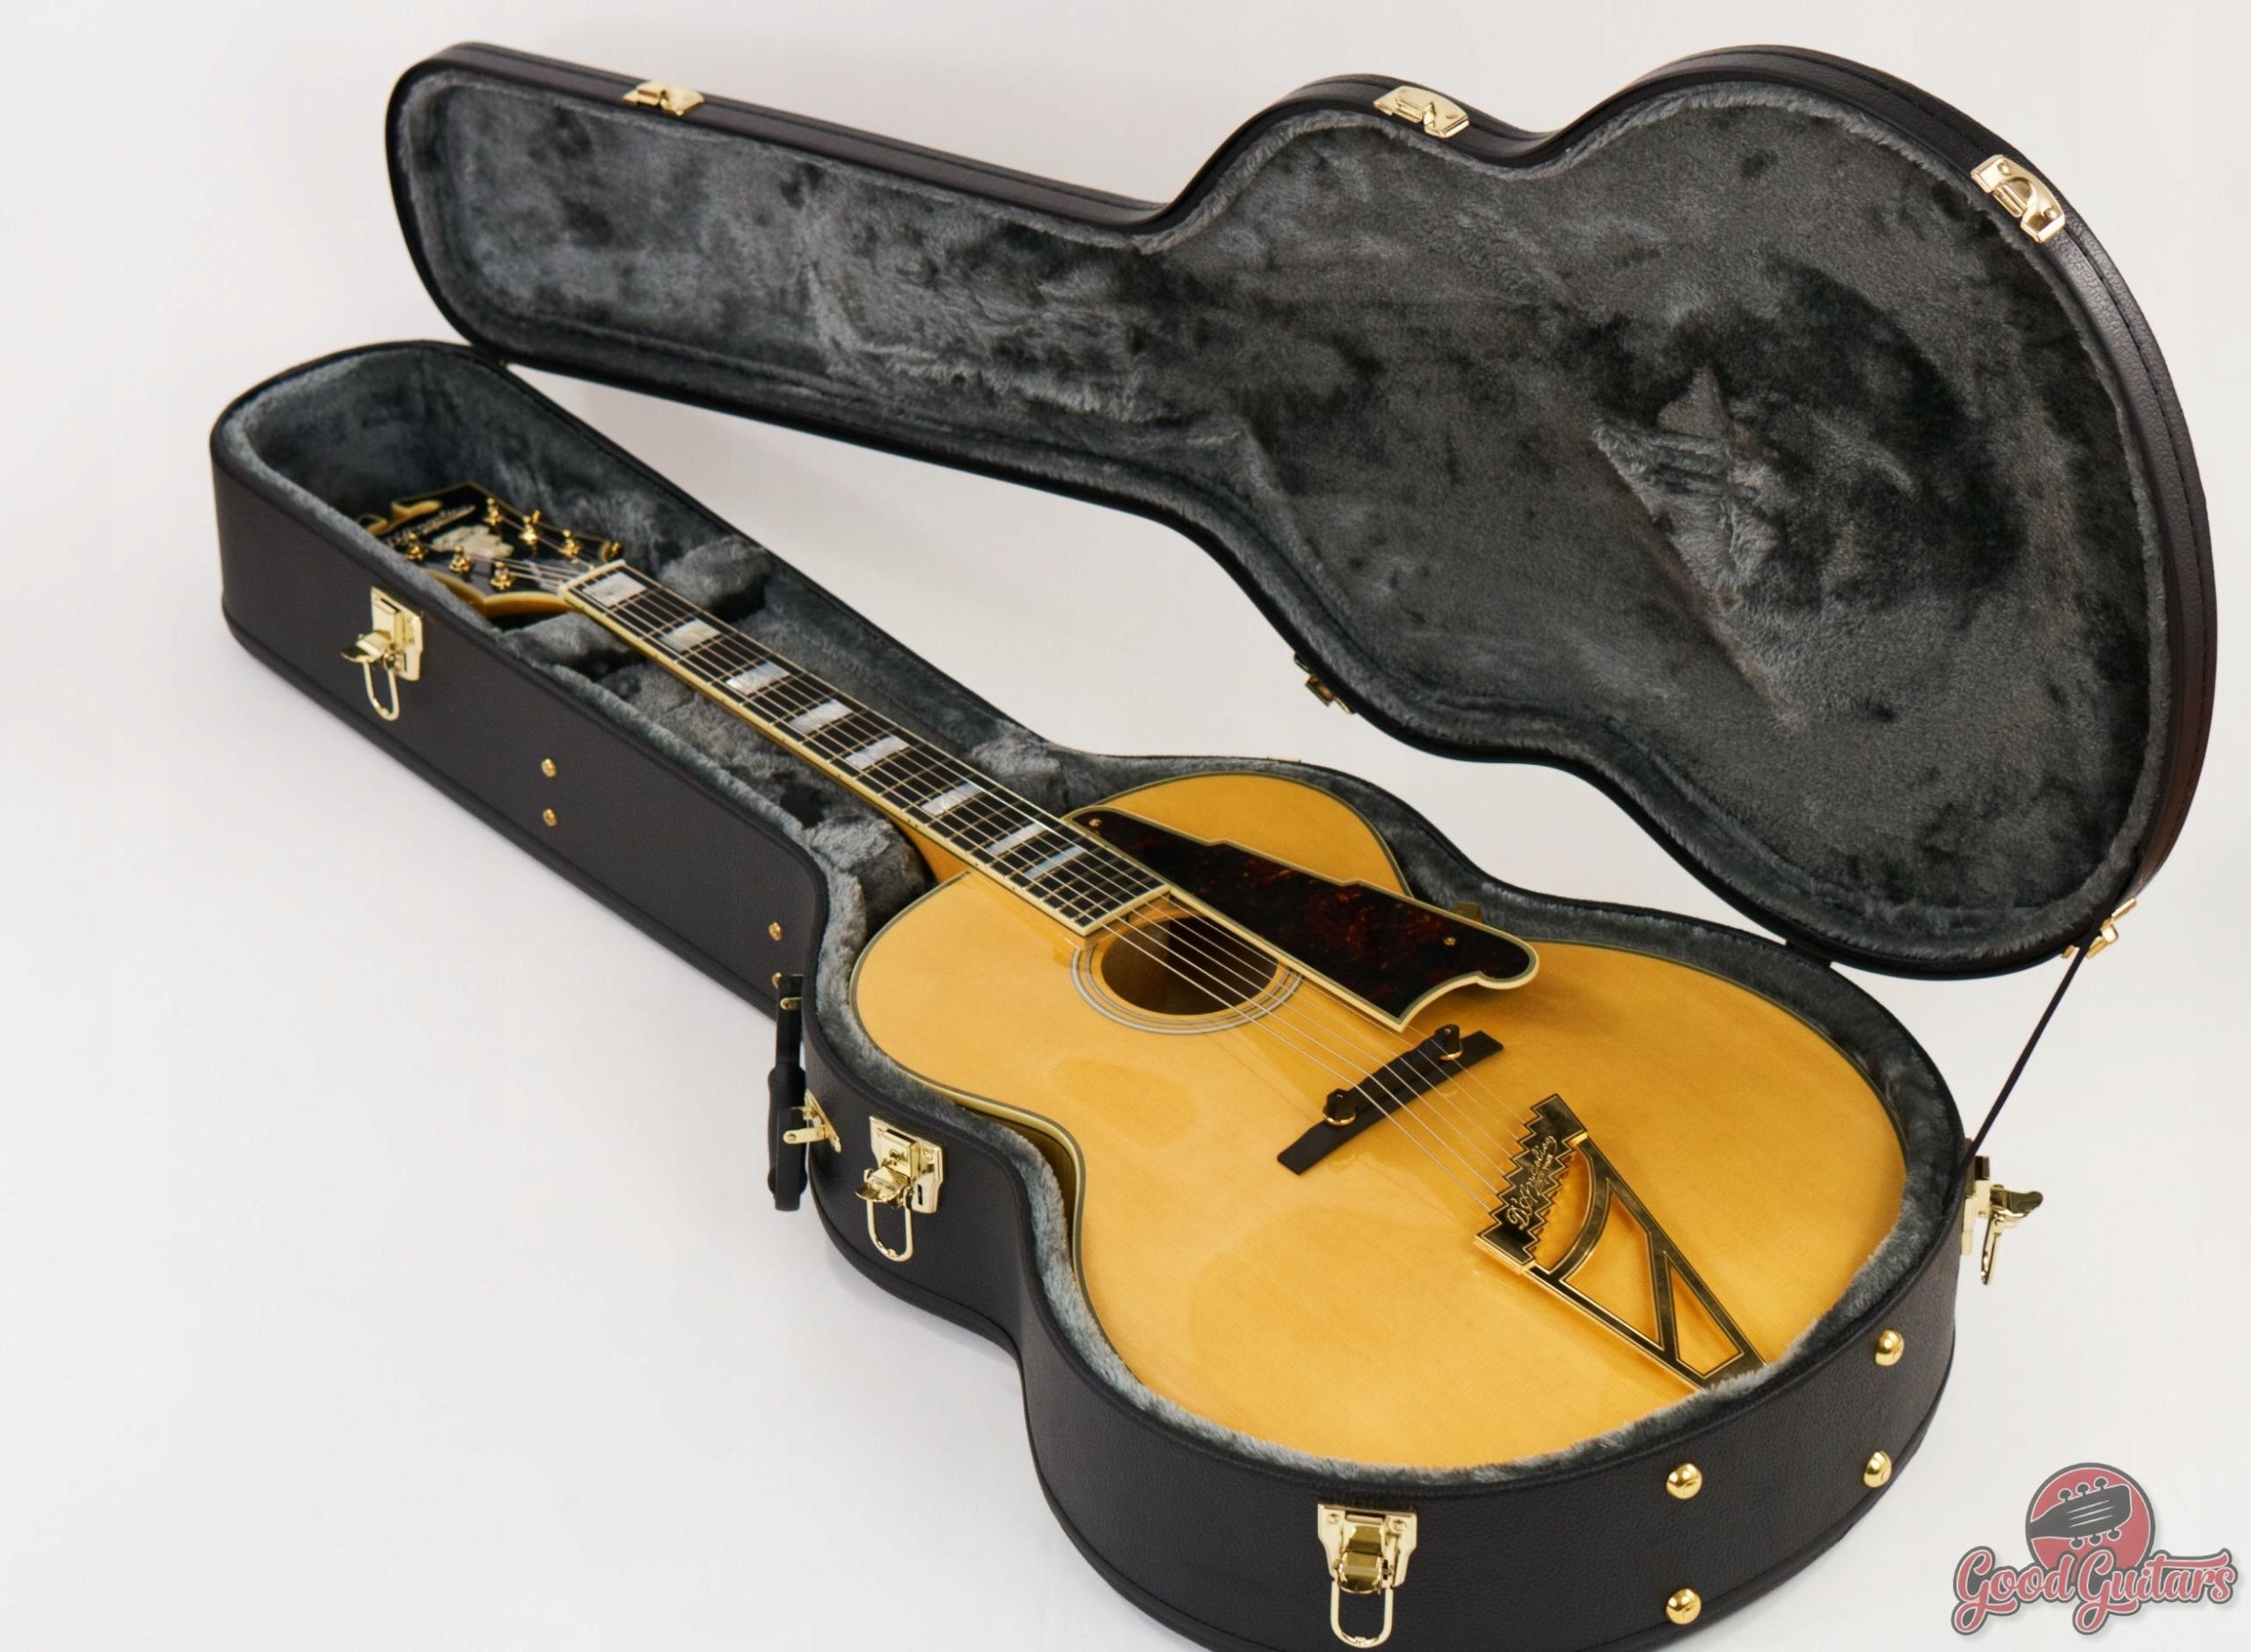 D'Angelico EX-63 NA Jazz Archtop Gitara elektro-ak